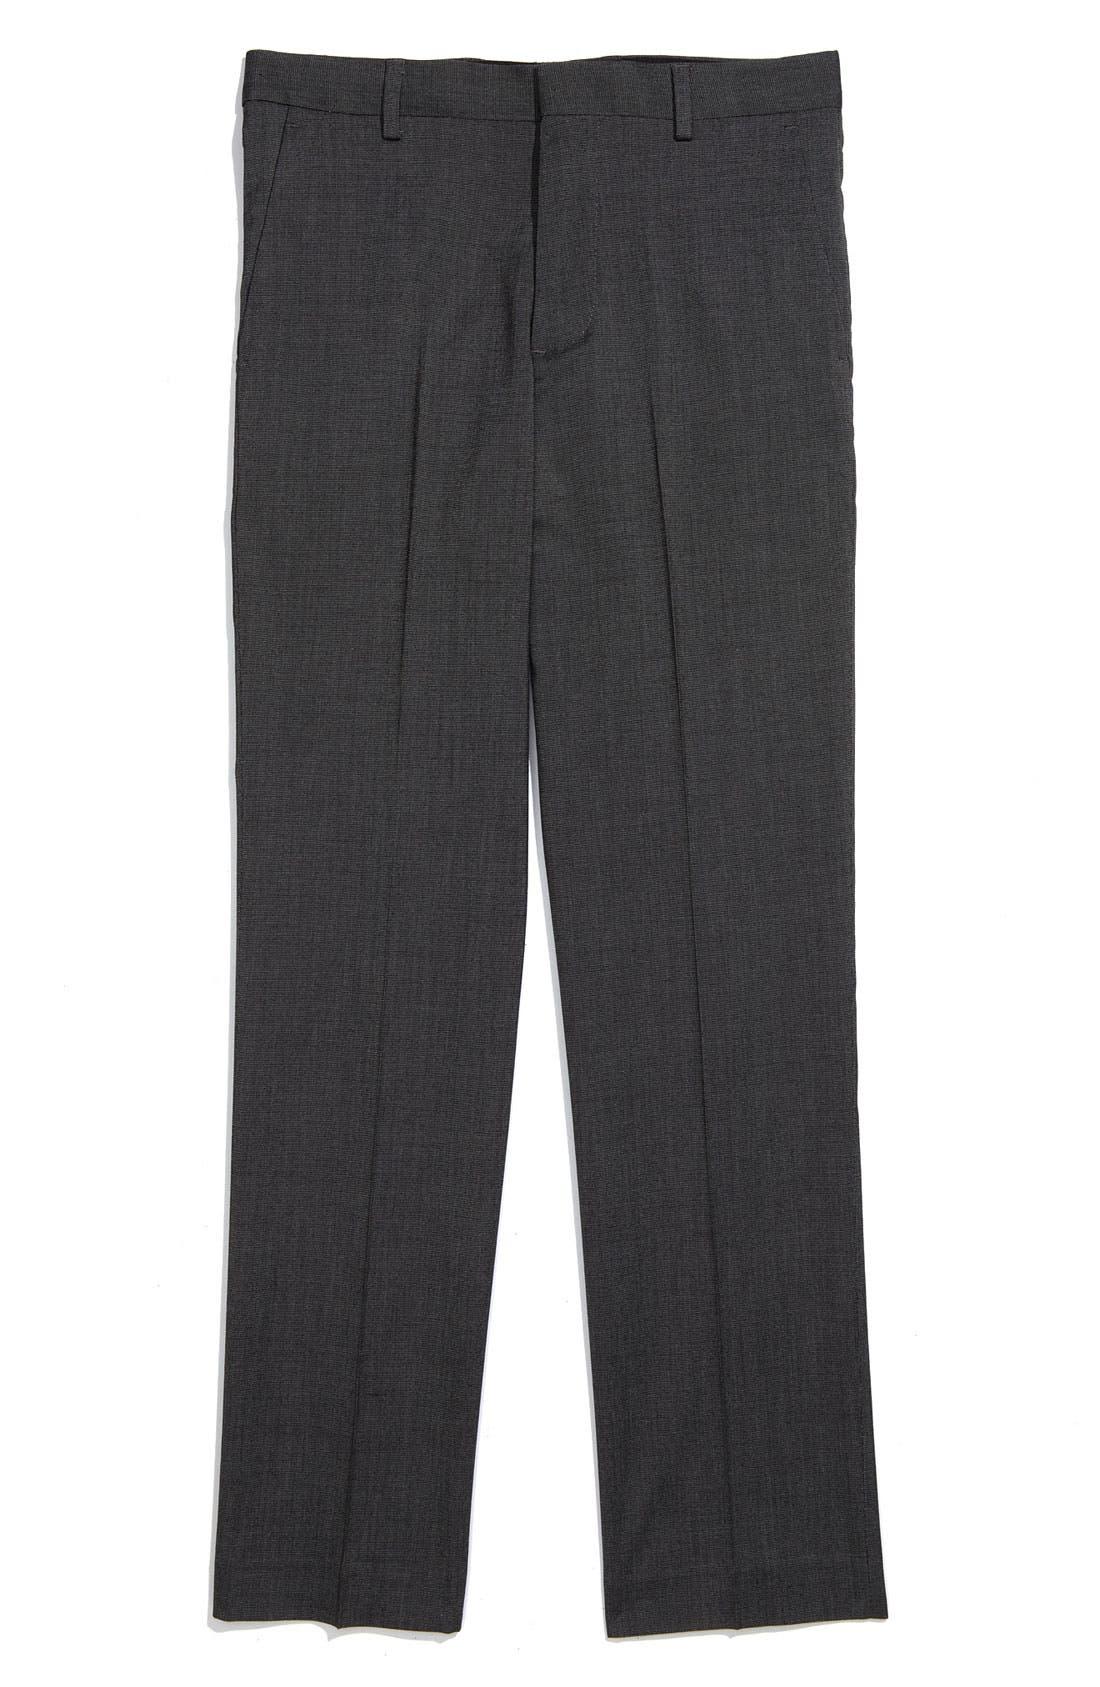 Alternate Image 1 Selected - C2 by Calibrate Flat Front Slim Fit Pants (Big Boys)